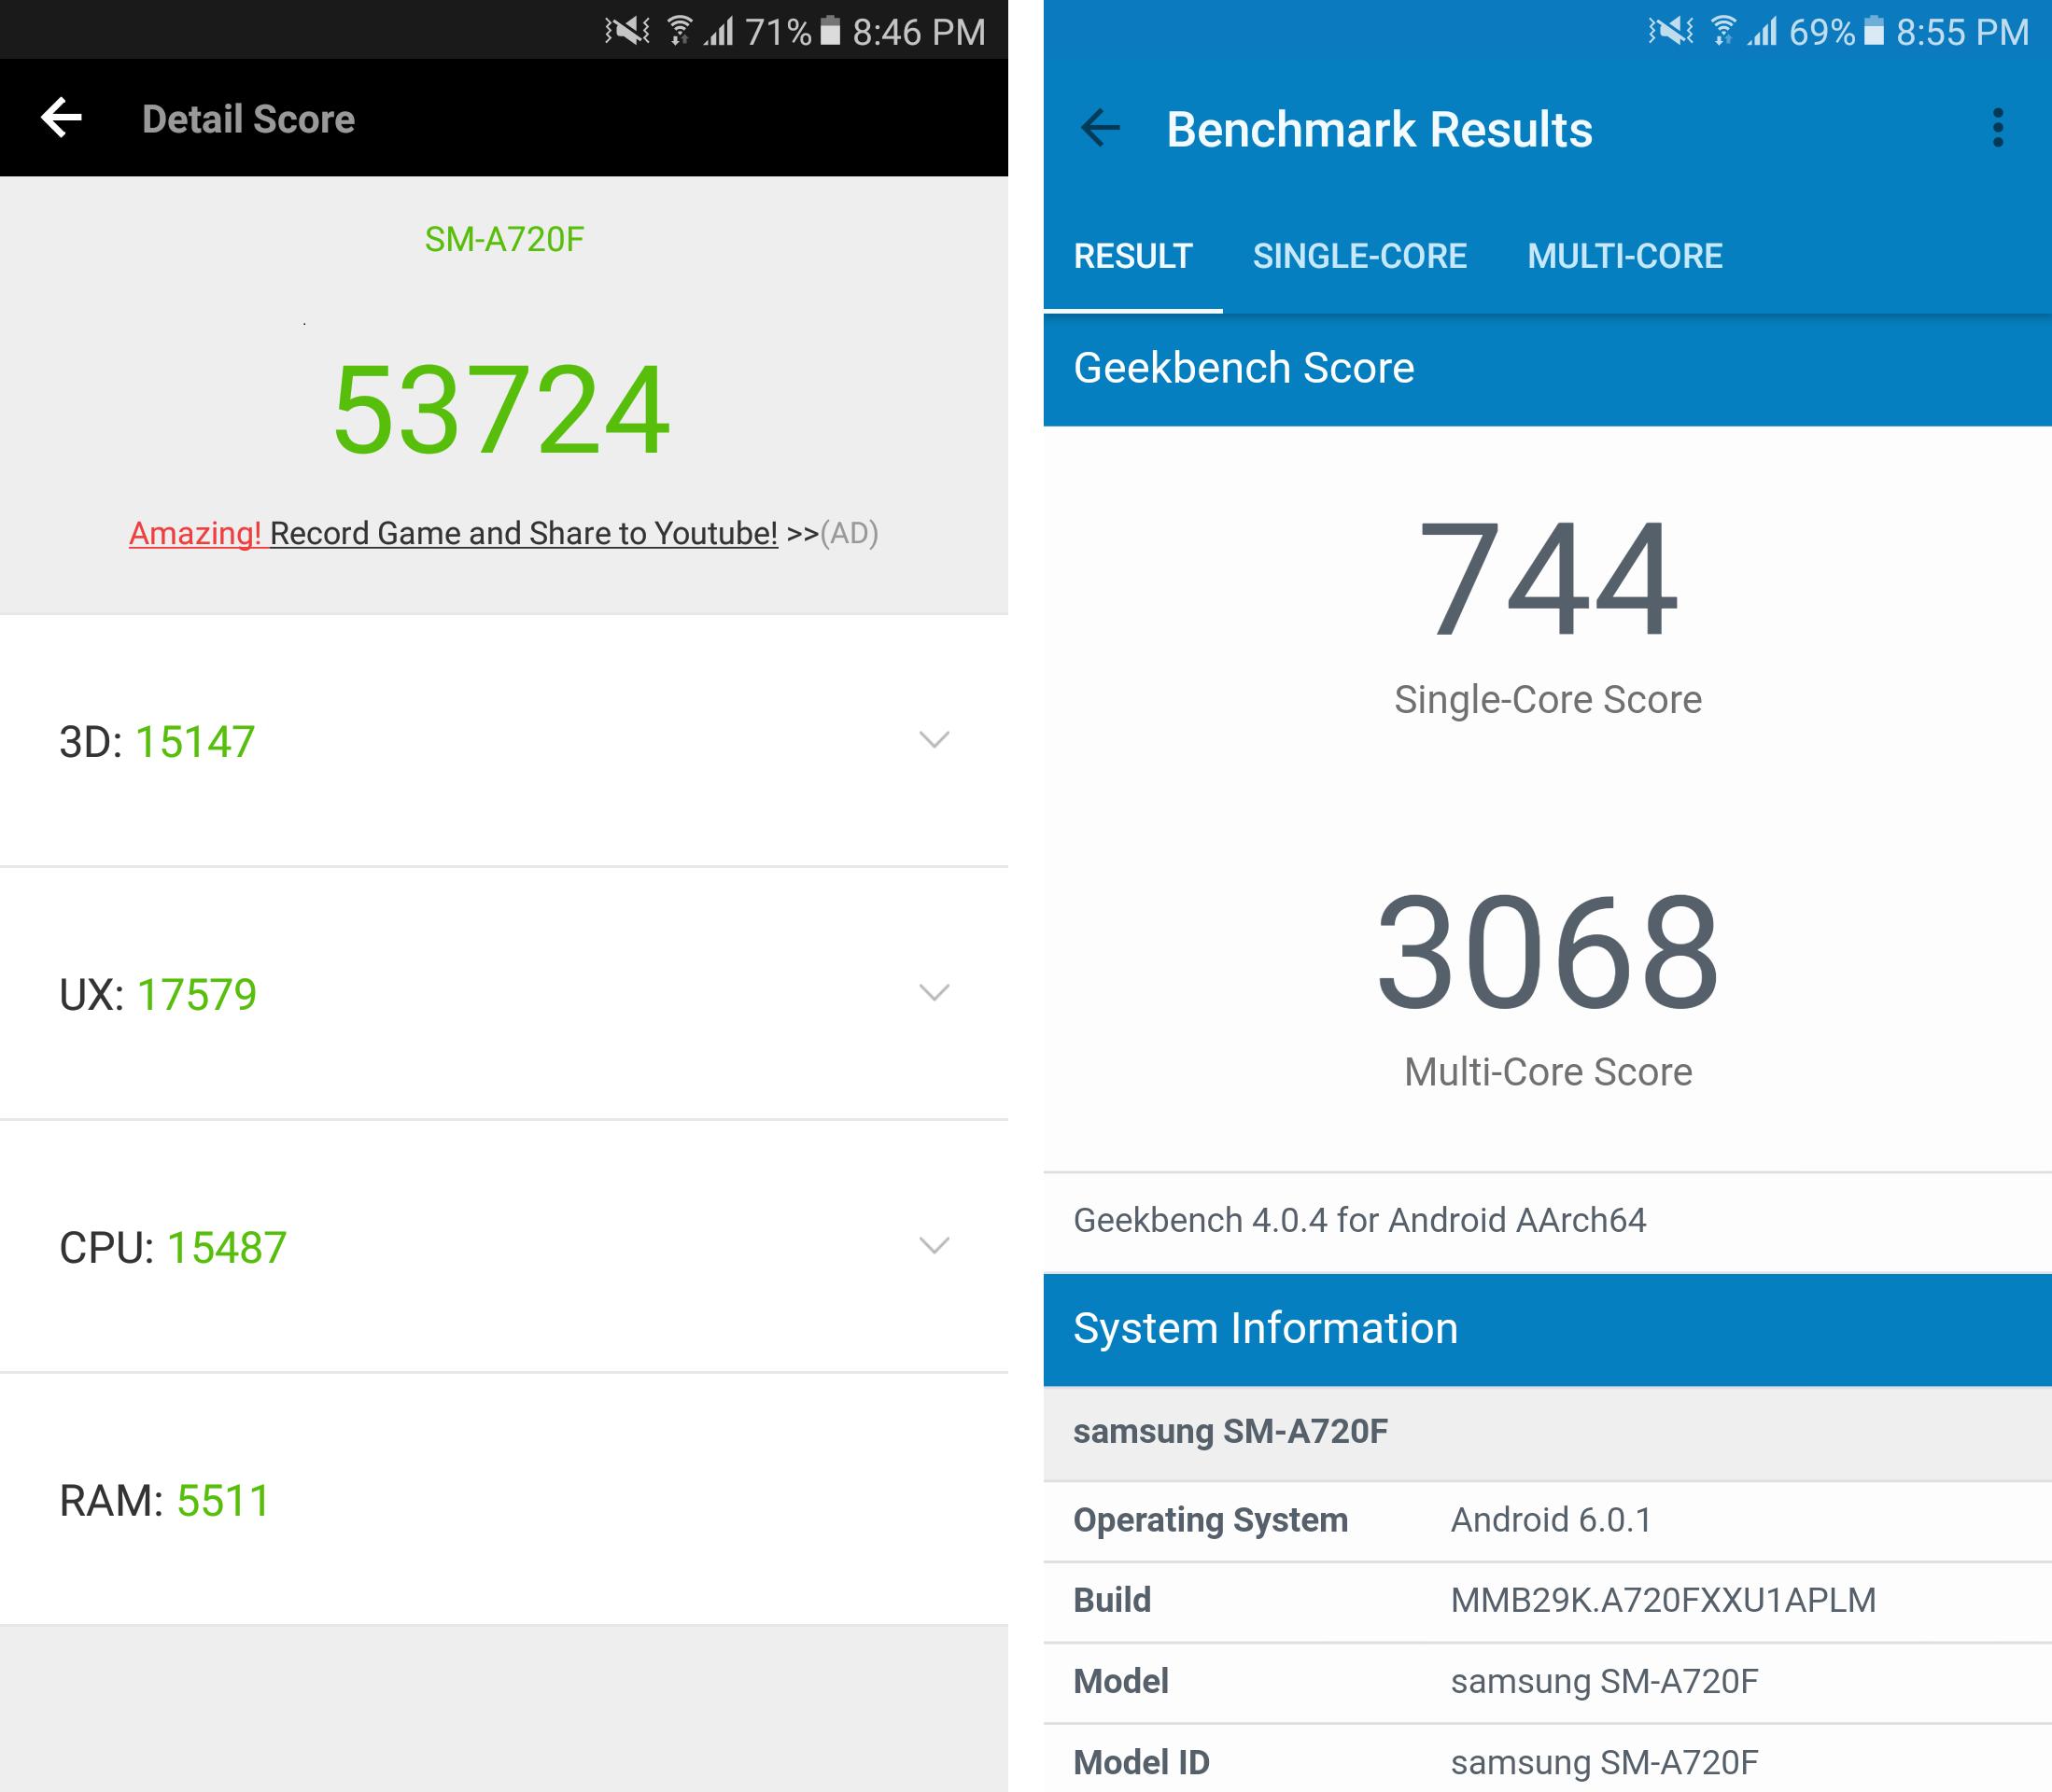 Samsung Galaxy A7 2017 review: Benchmark scores